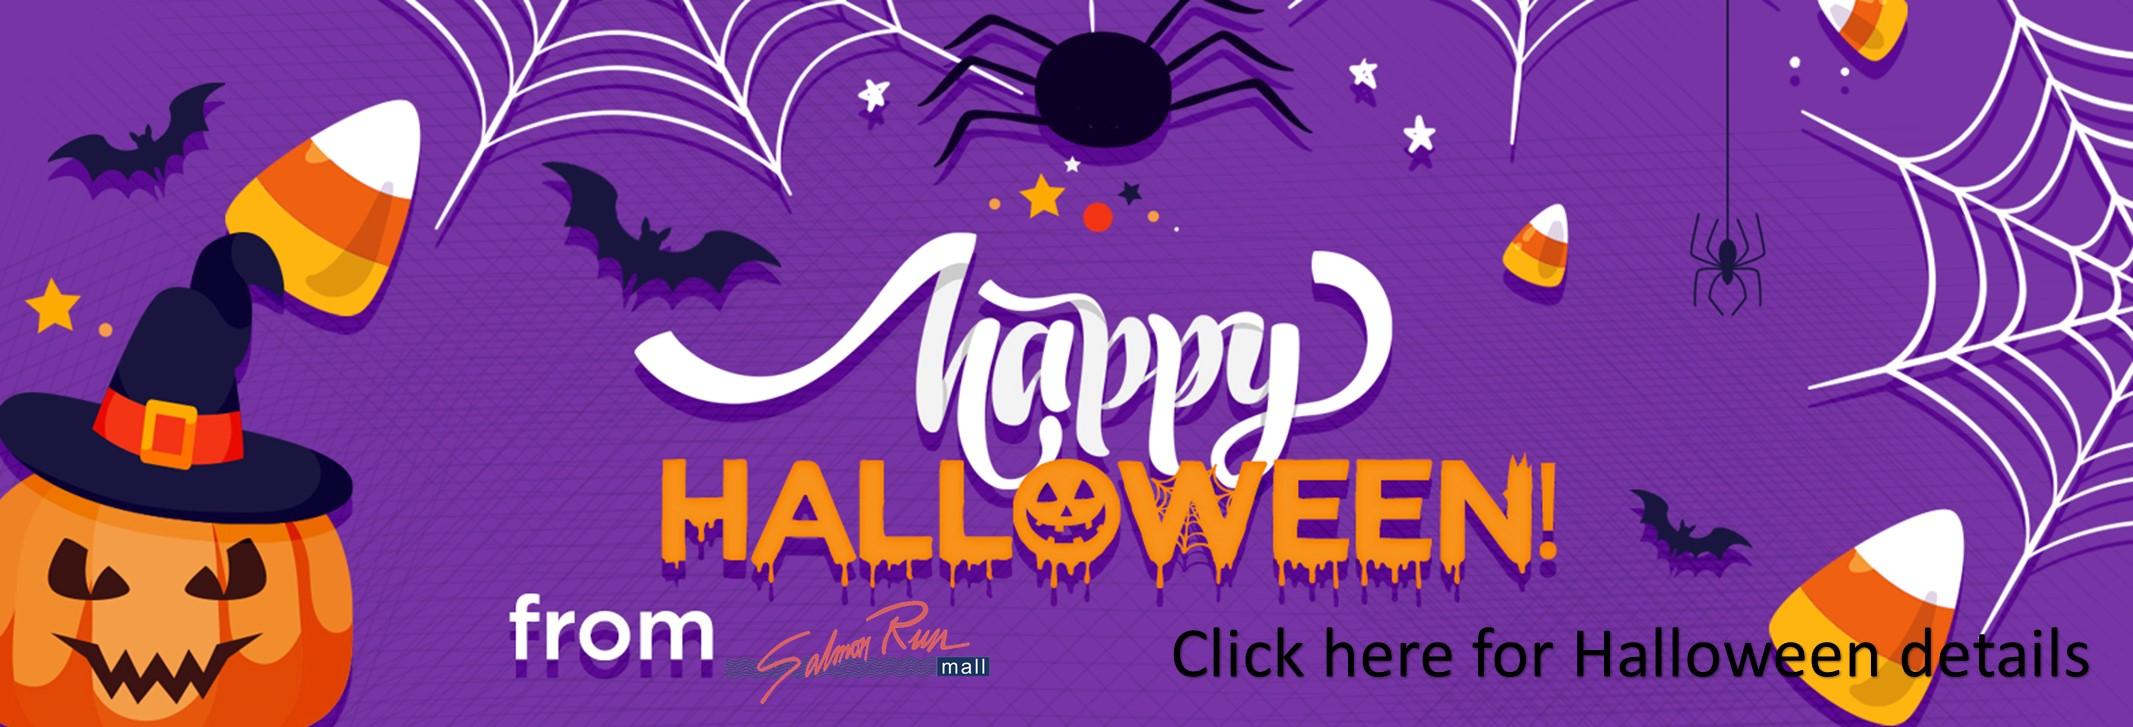 2020 10 14 Halloween slider SRM